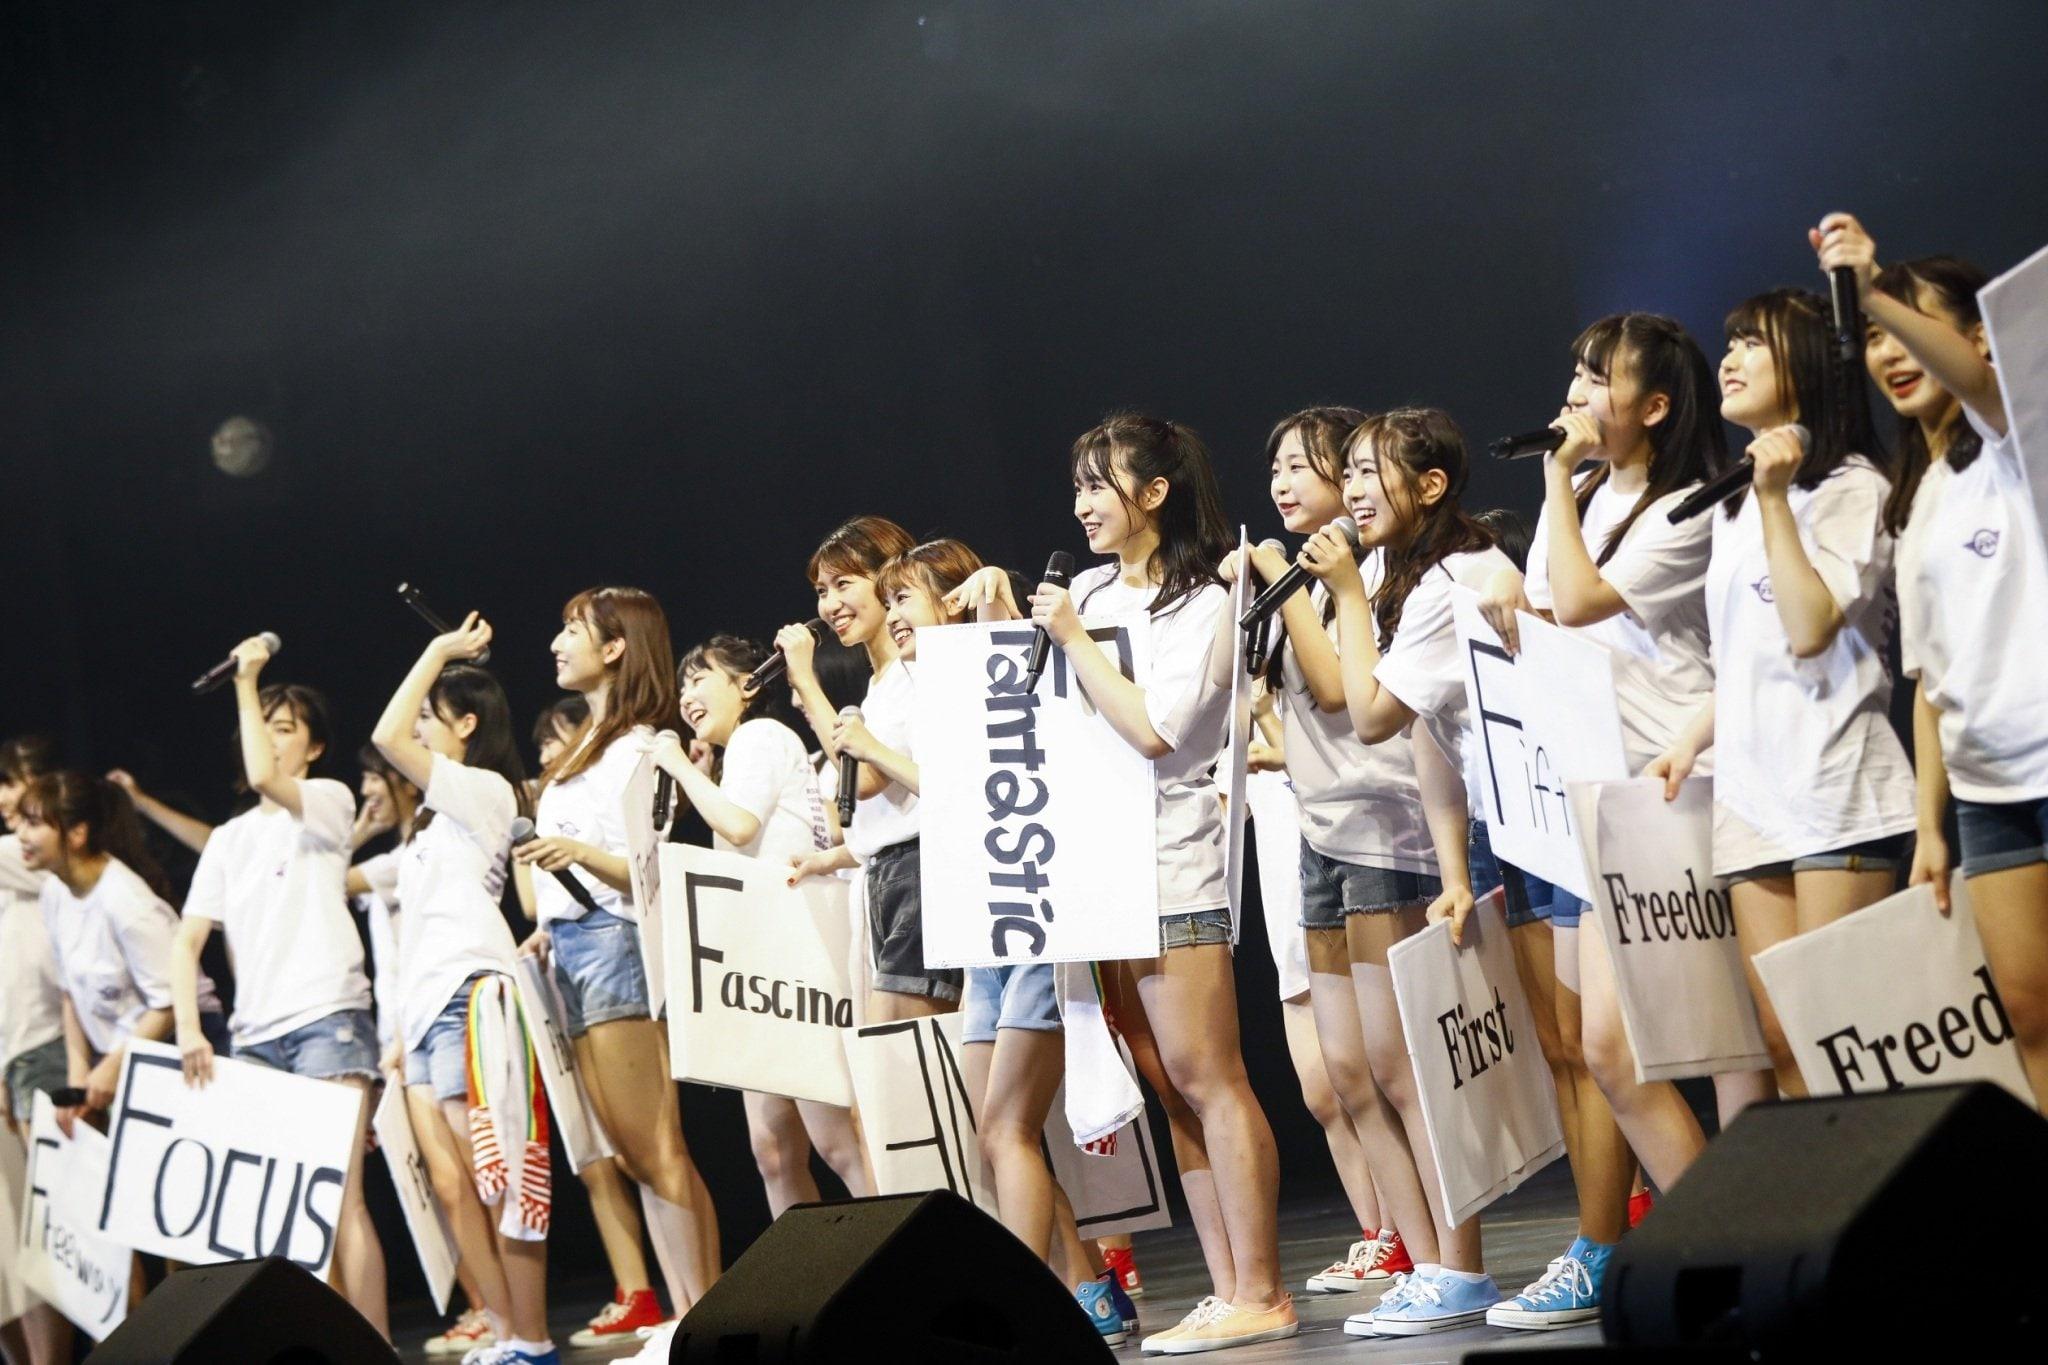 HKT48の若手メンバー、〈F24〉の公演が満員御礼!【写真20枚】の画像005